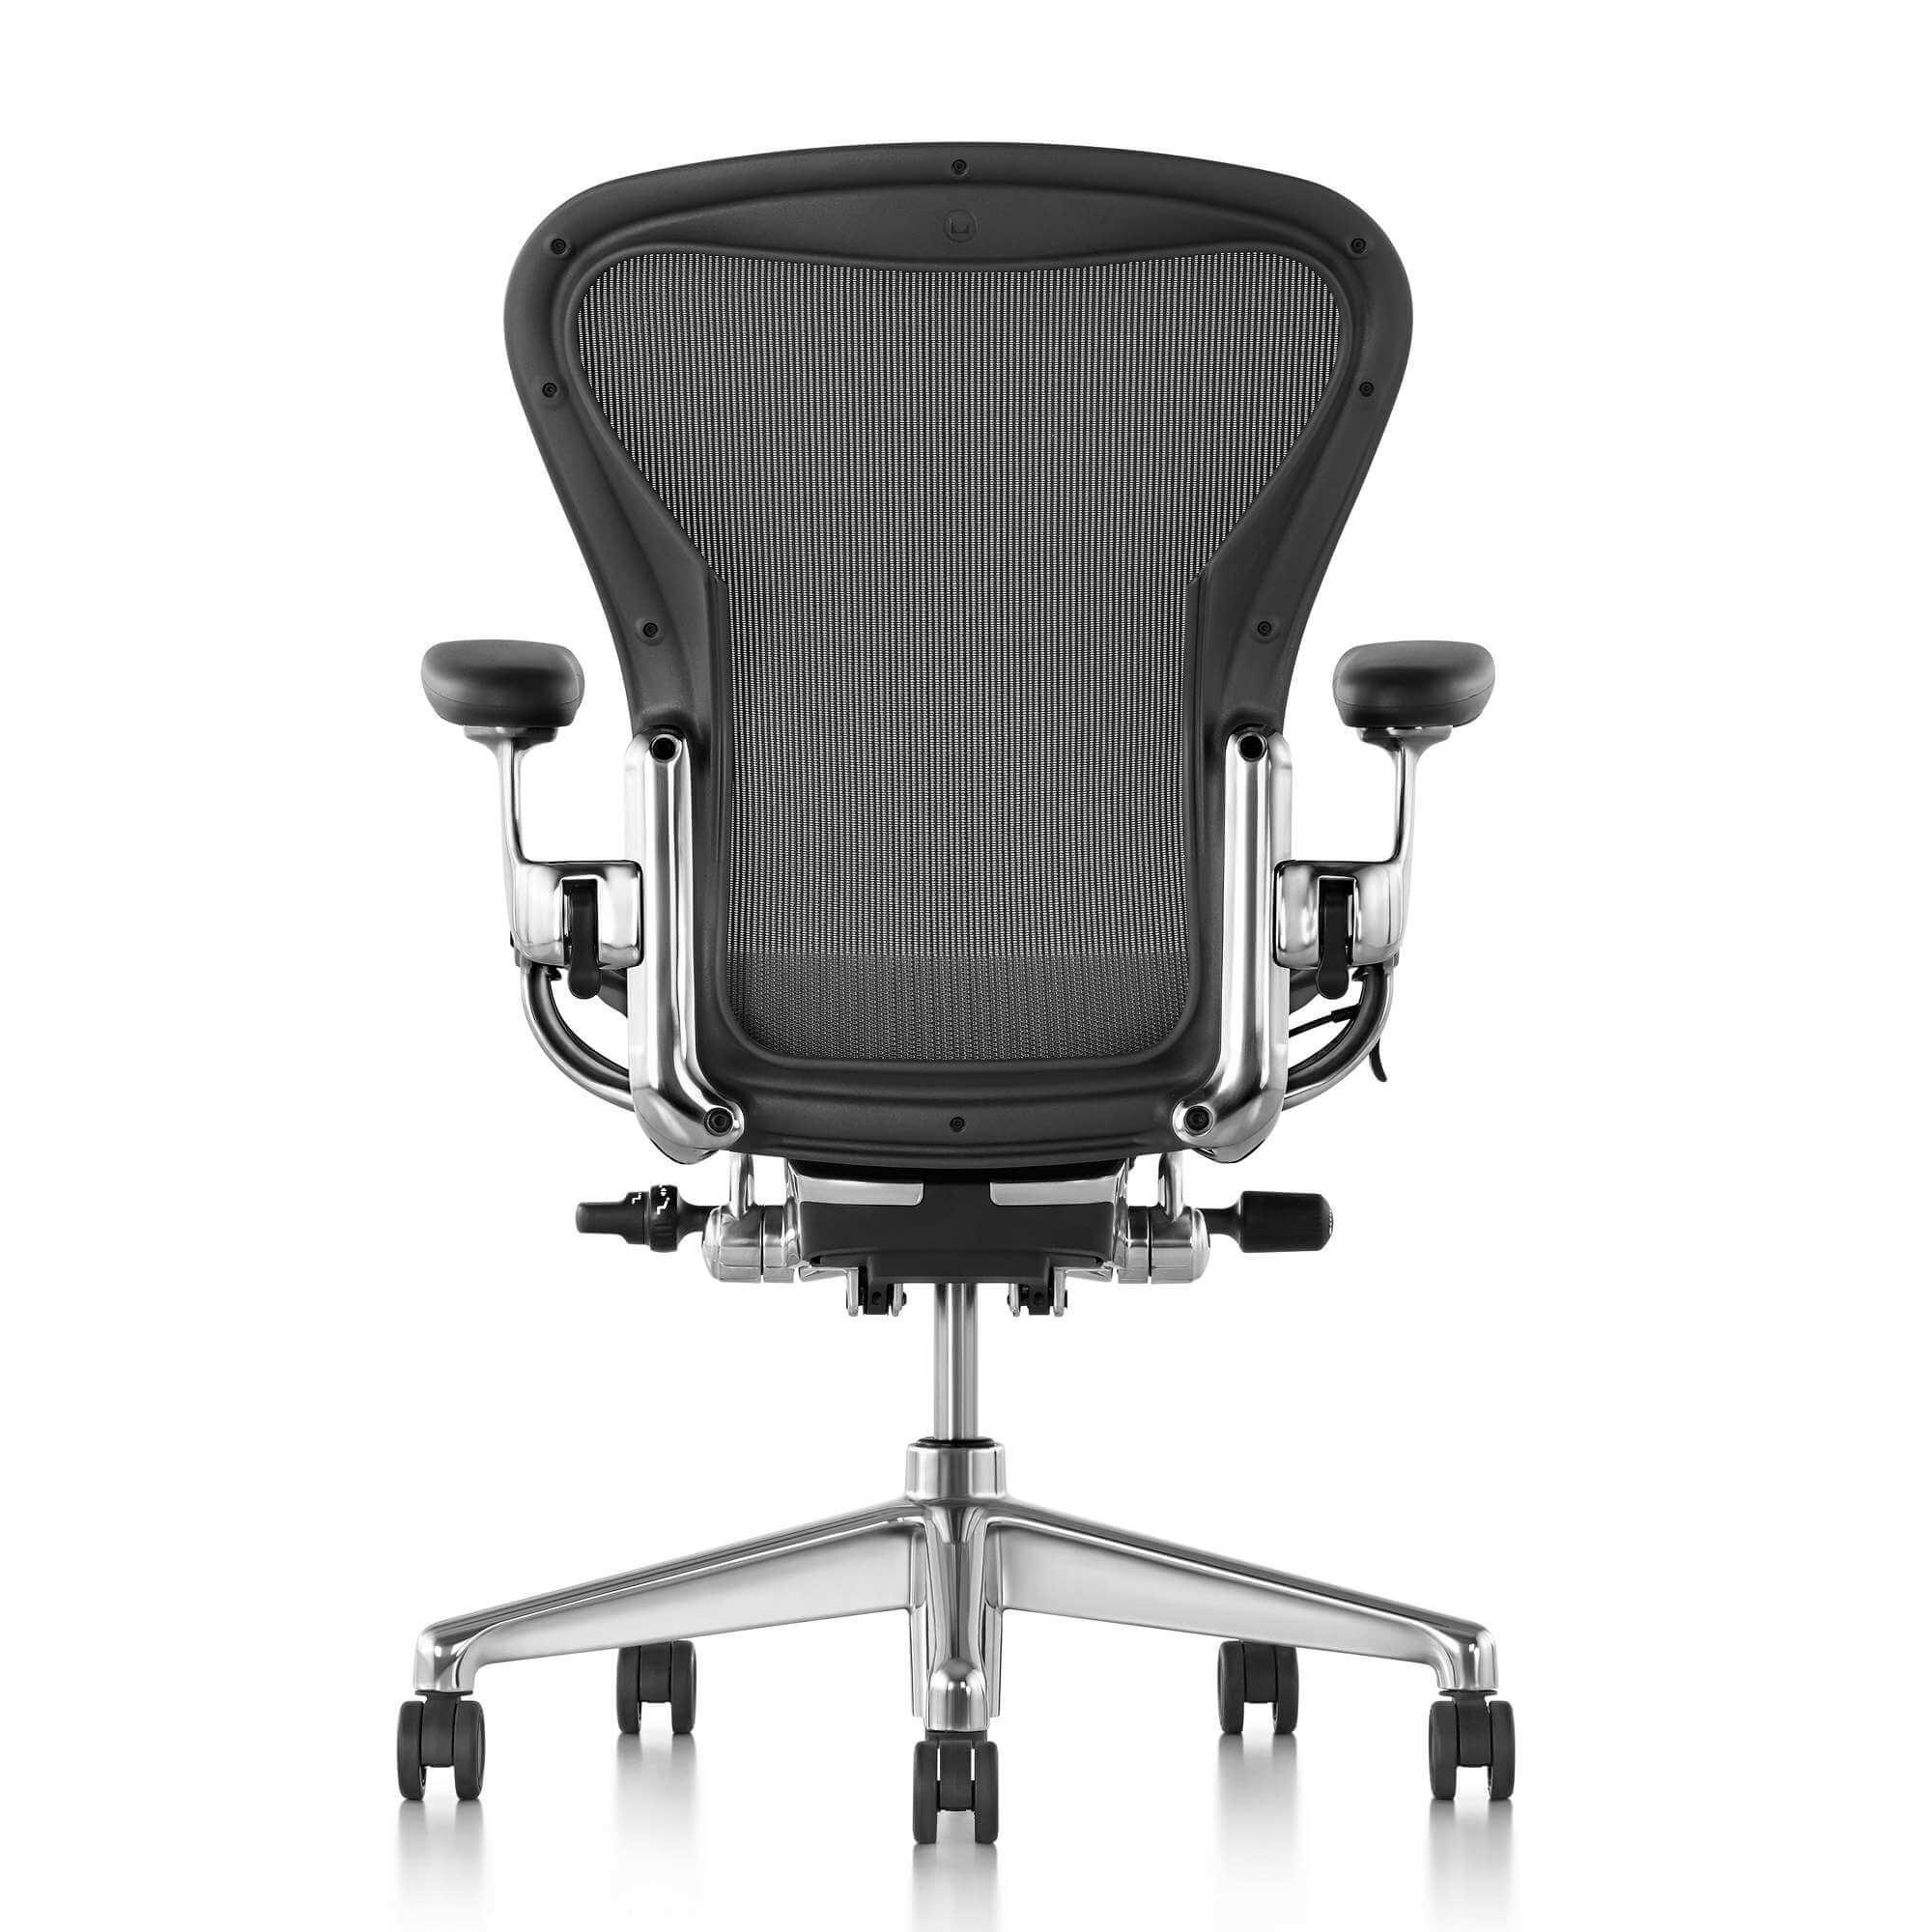 Ergonomic Office Chair 4